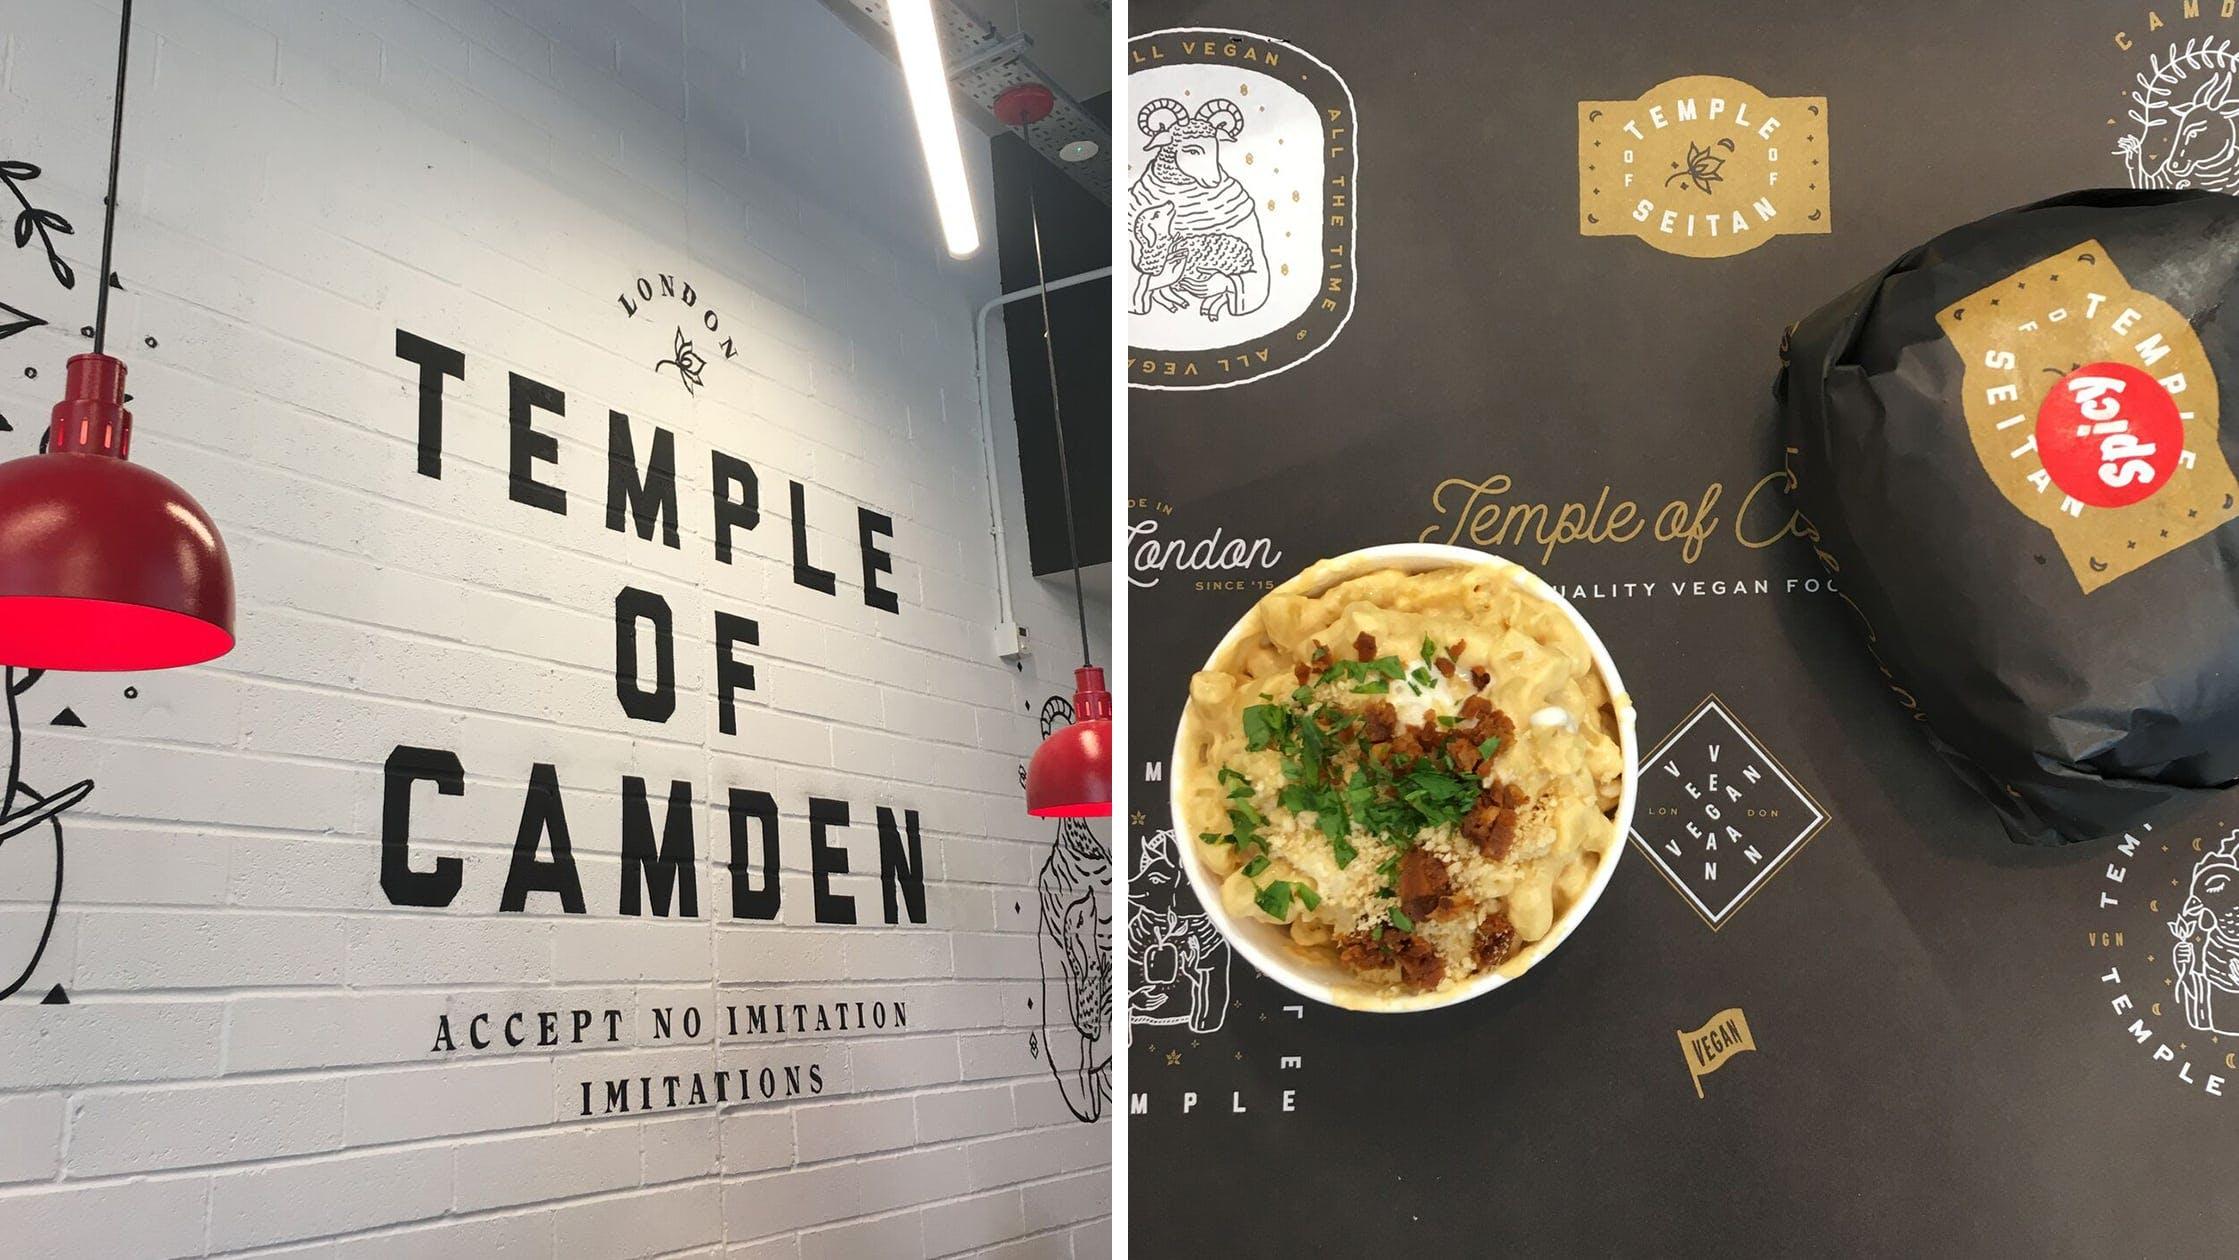 Temple of Camden, London, United Kindgom